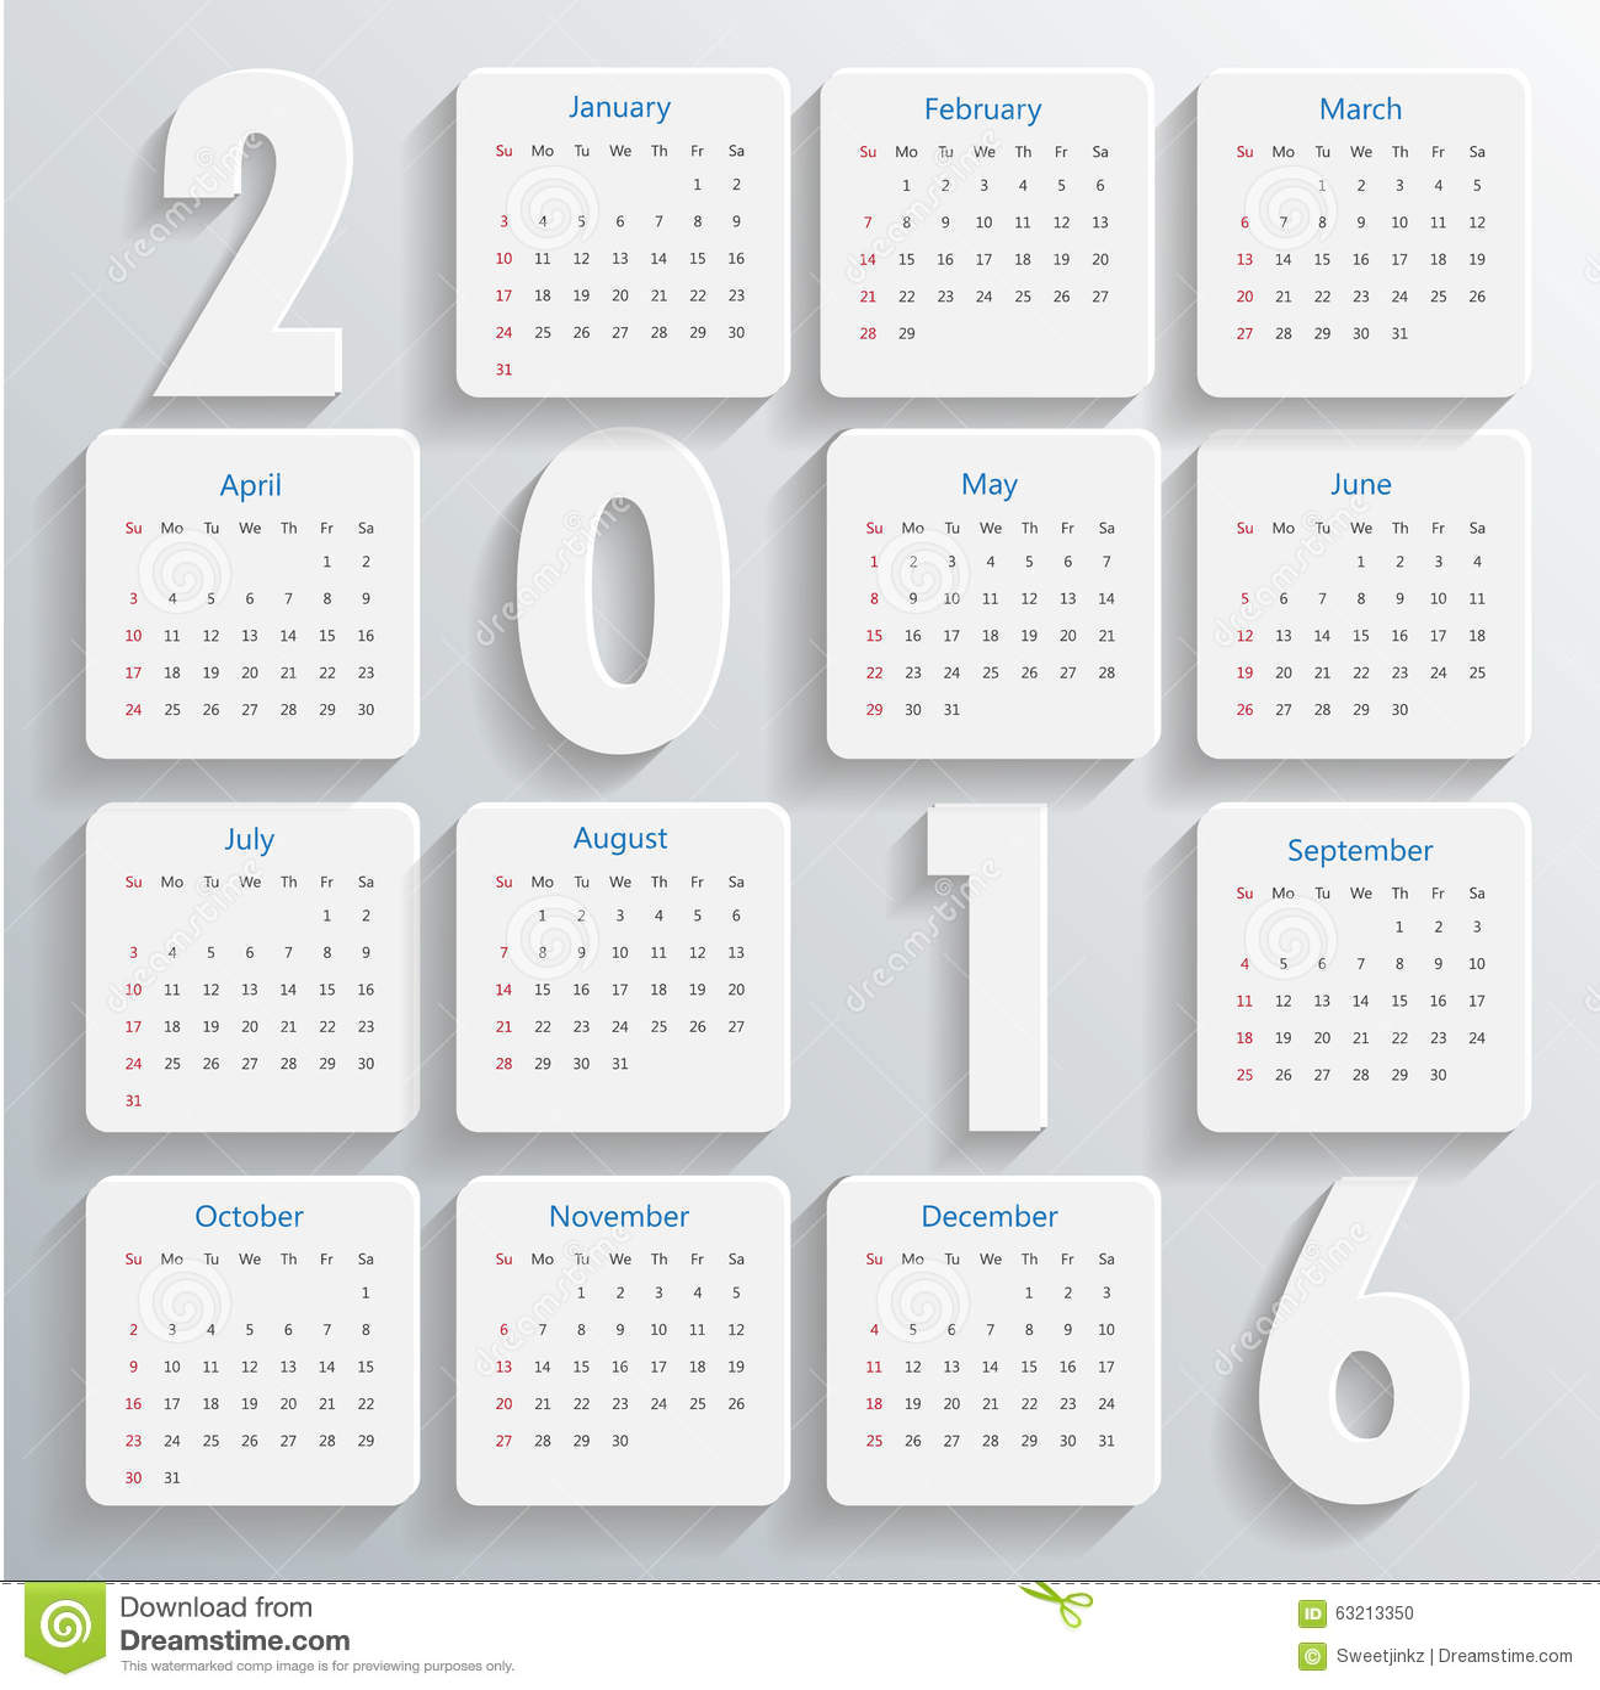 Calendar Template Vector : Modern calendar template vector illustration